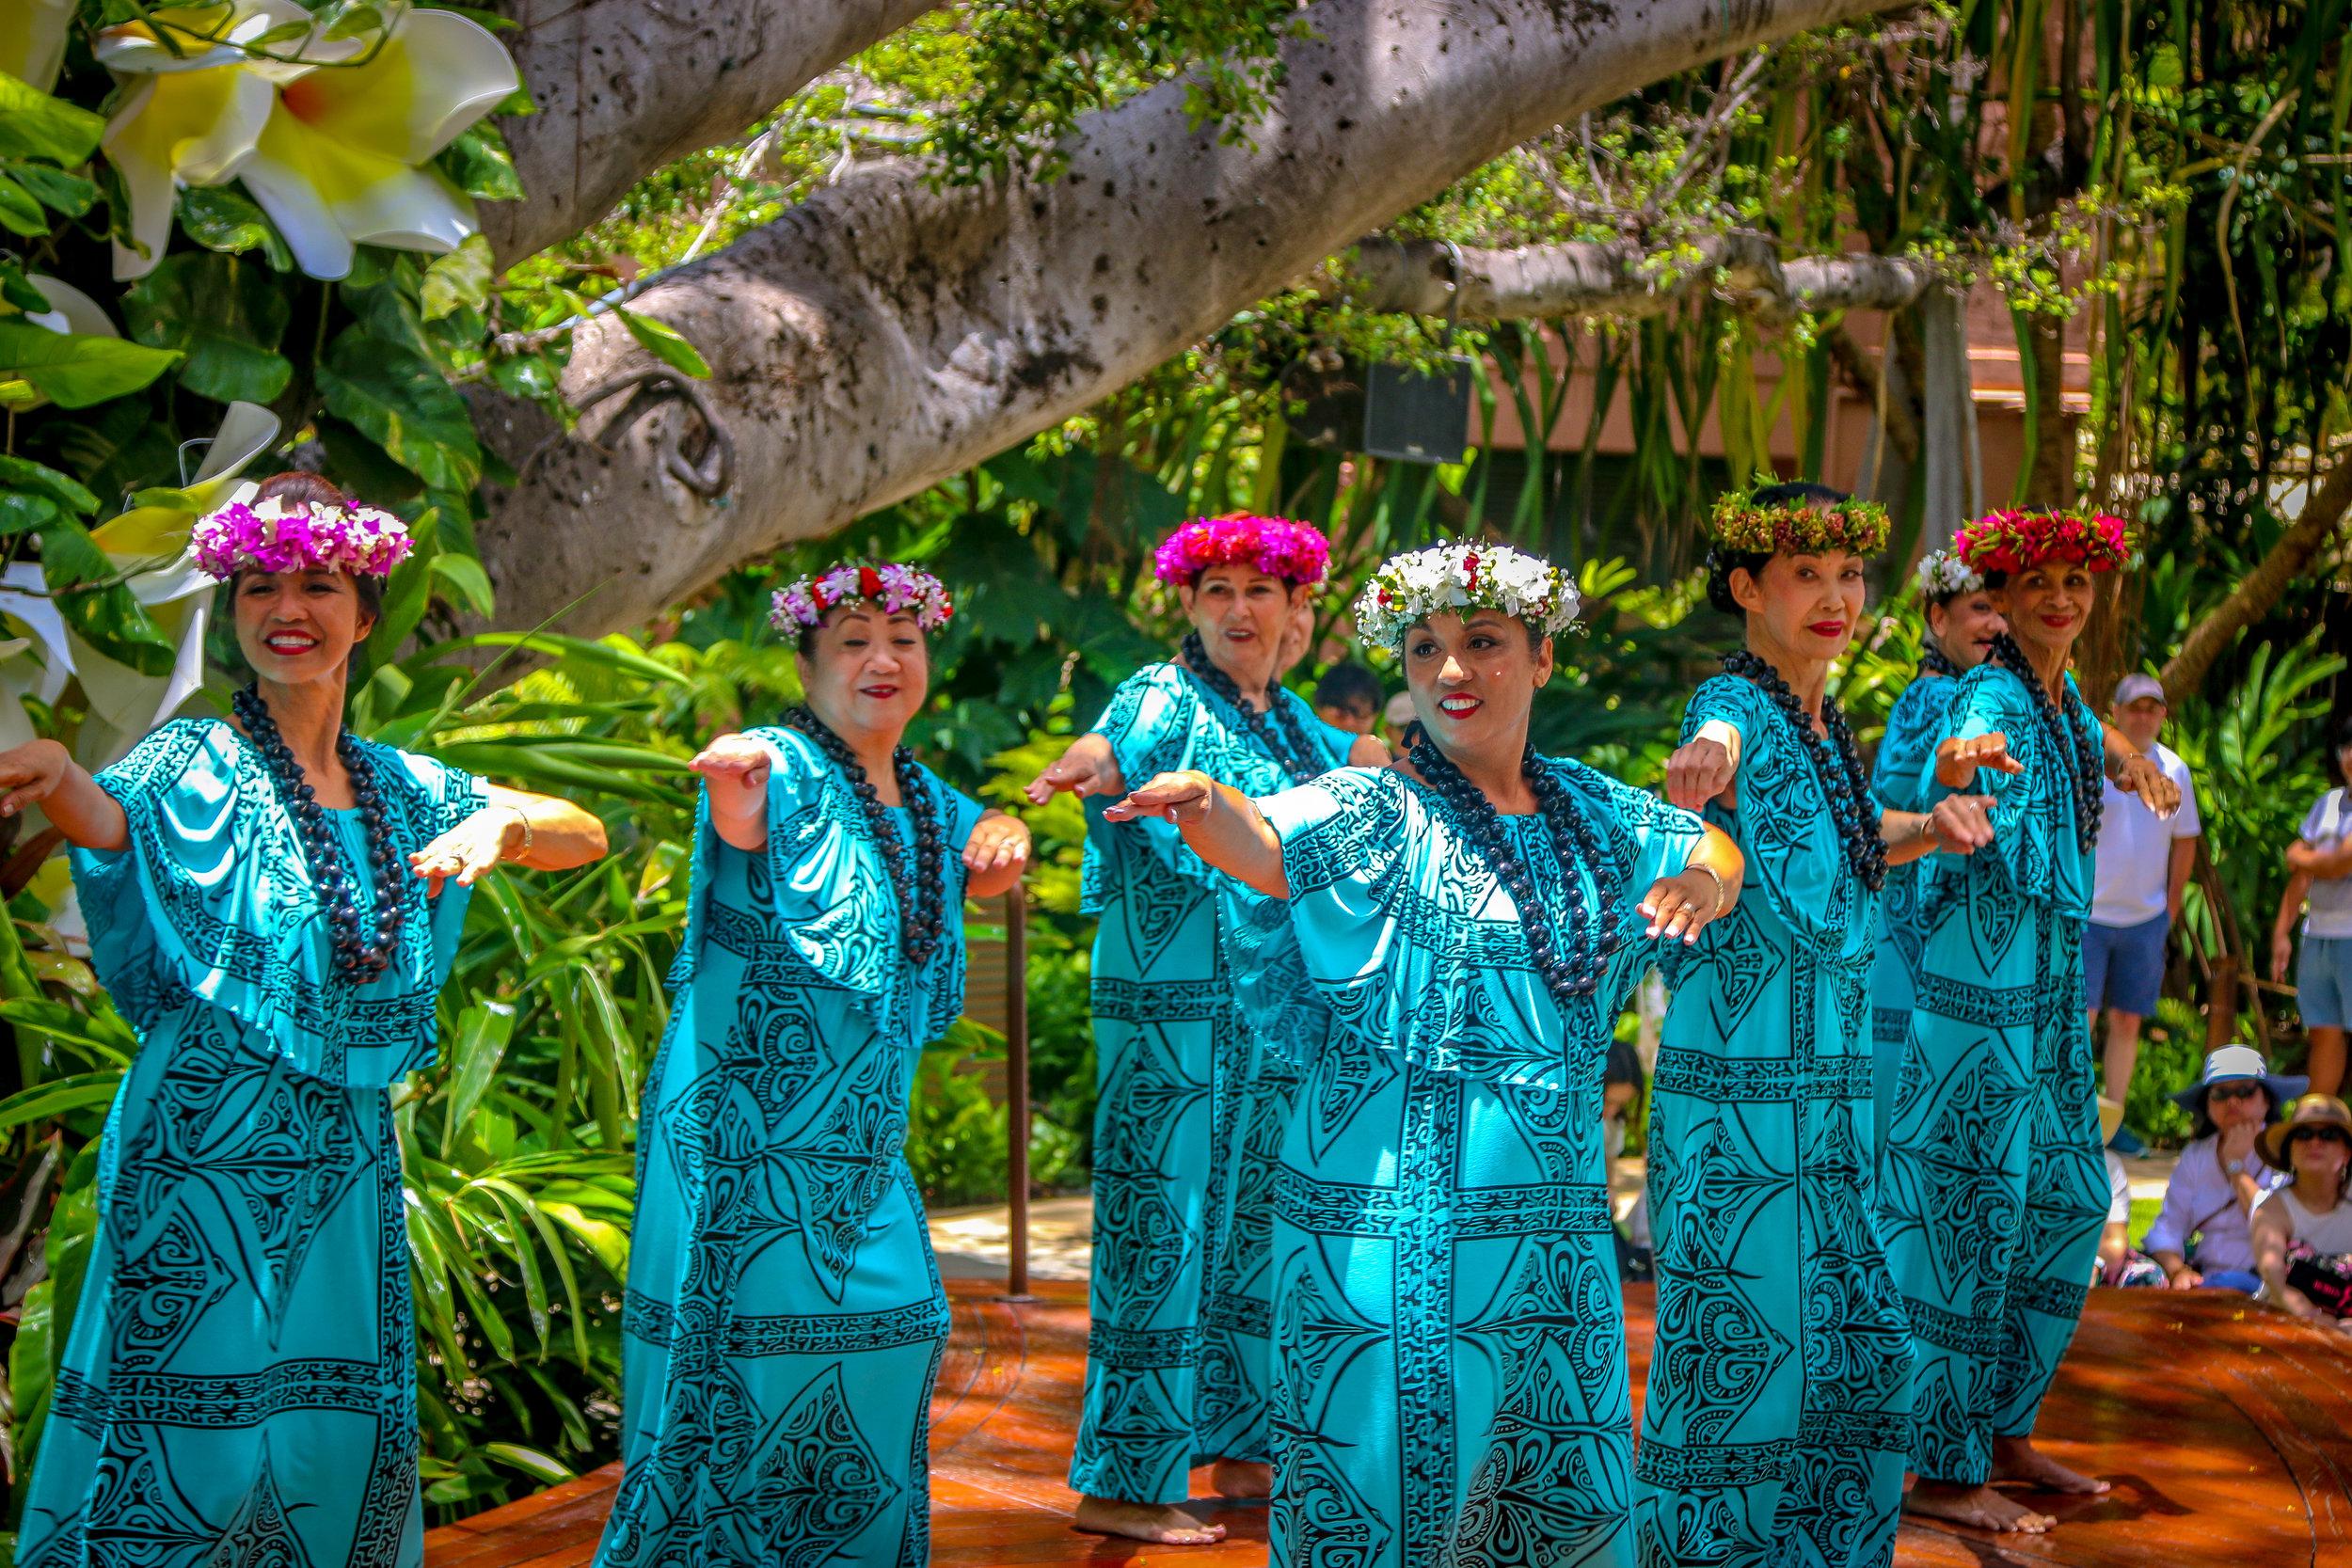 Oahu Hawaii HI photos photography Hula dancers waikiki